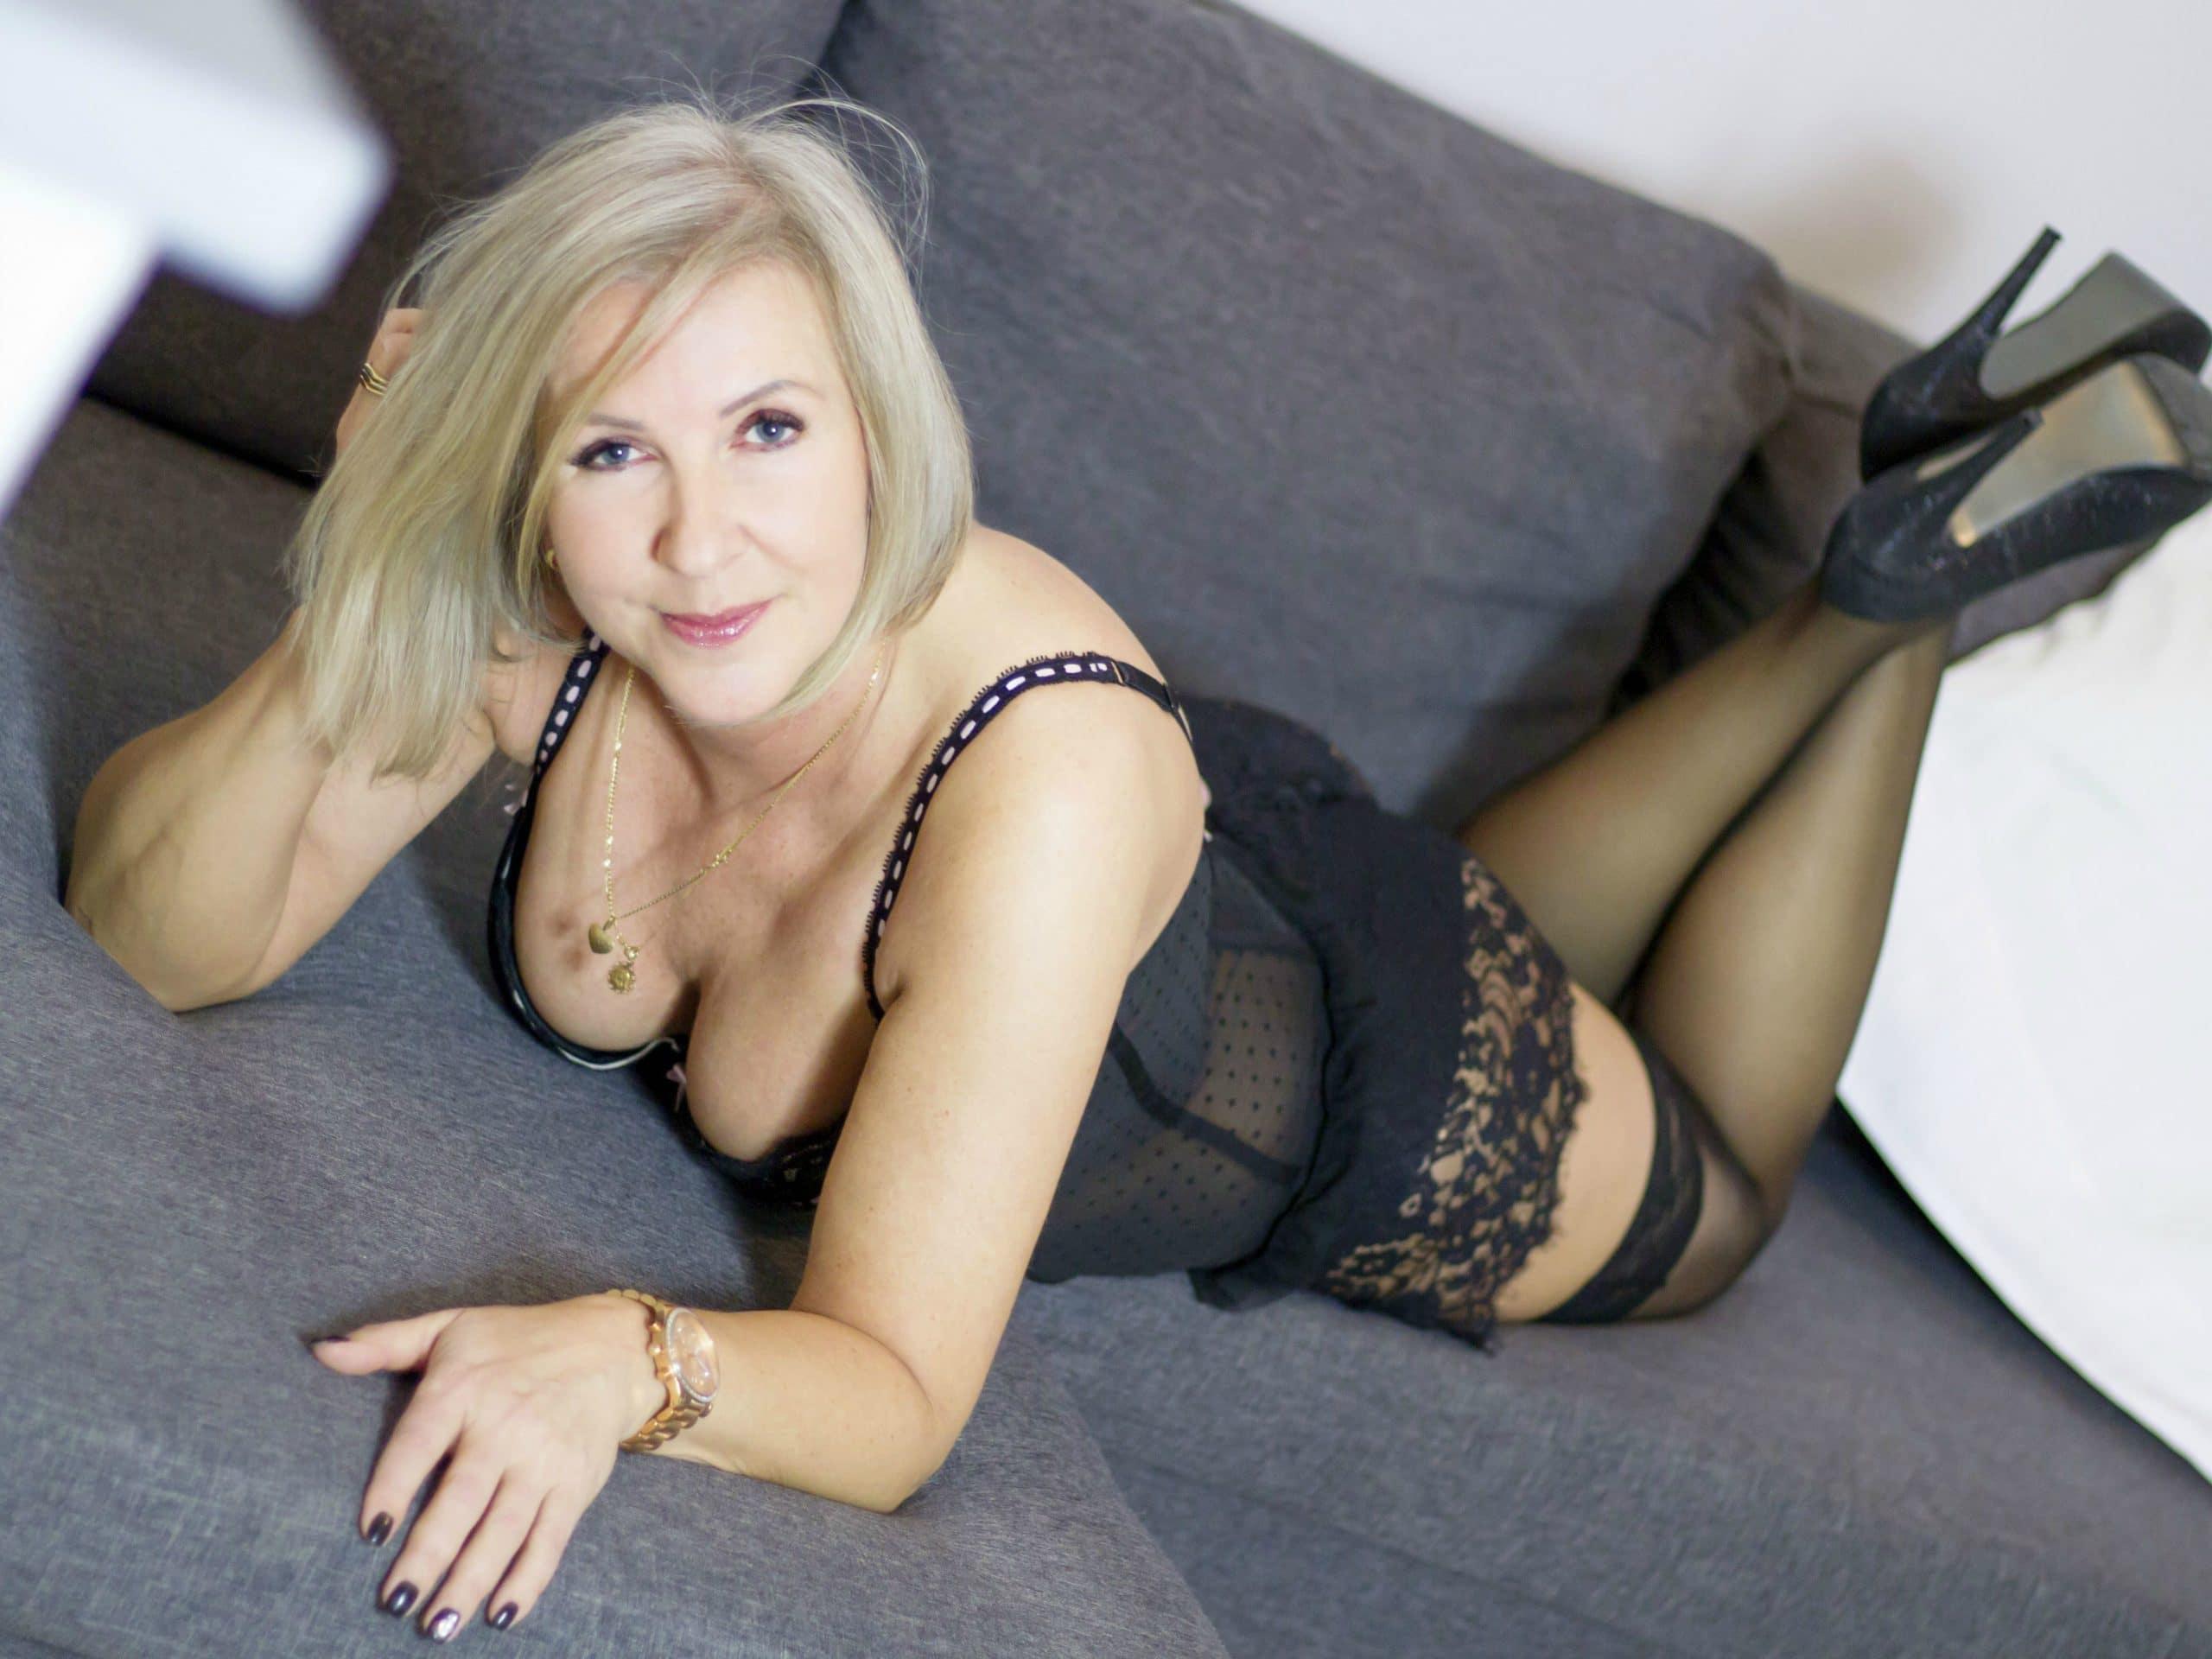 live Sexdates mit reifer Dame